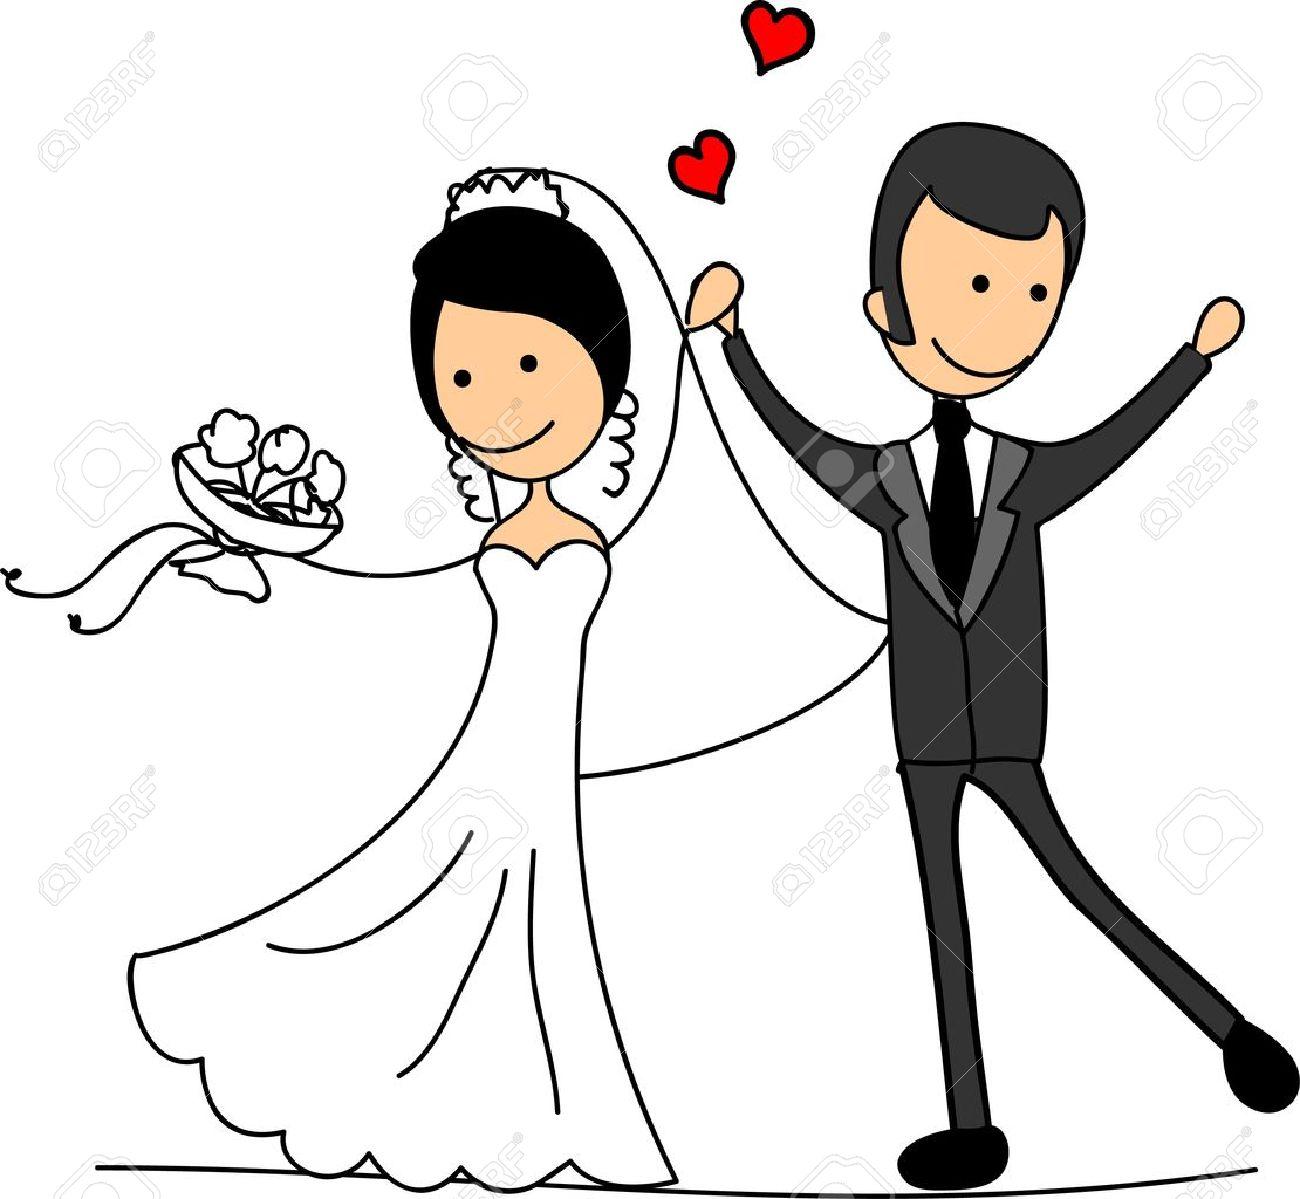 sweethearts and happy bride and groom royalty free cliparts vectors rh 123rf com clipart bride and groom cartoon wedding bride and groom clipart